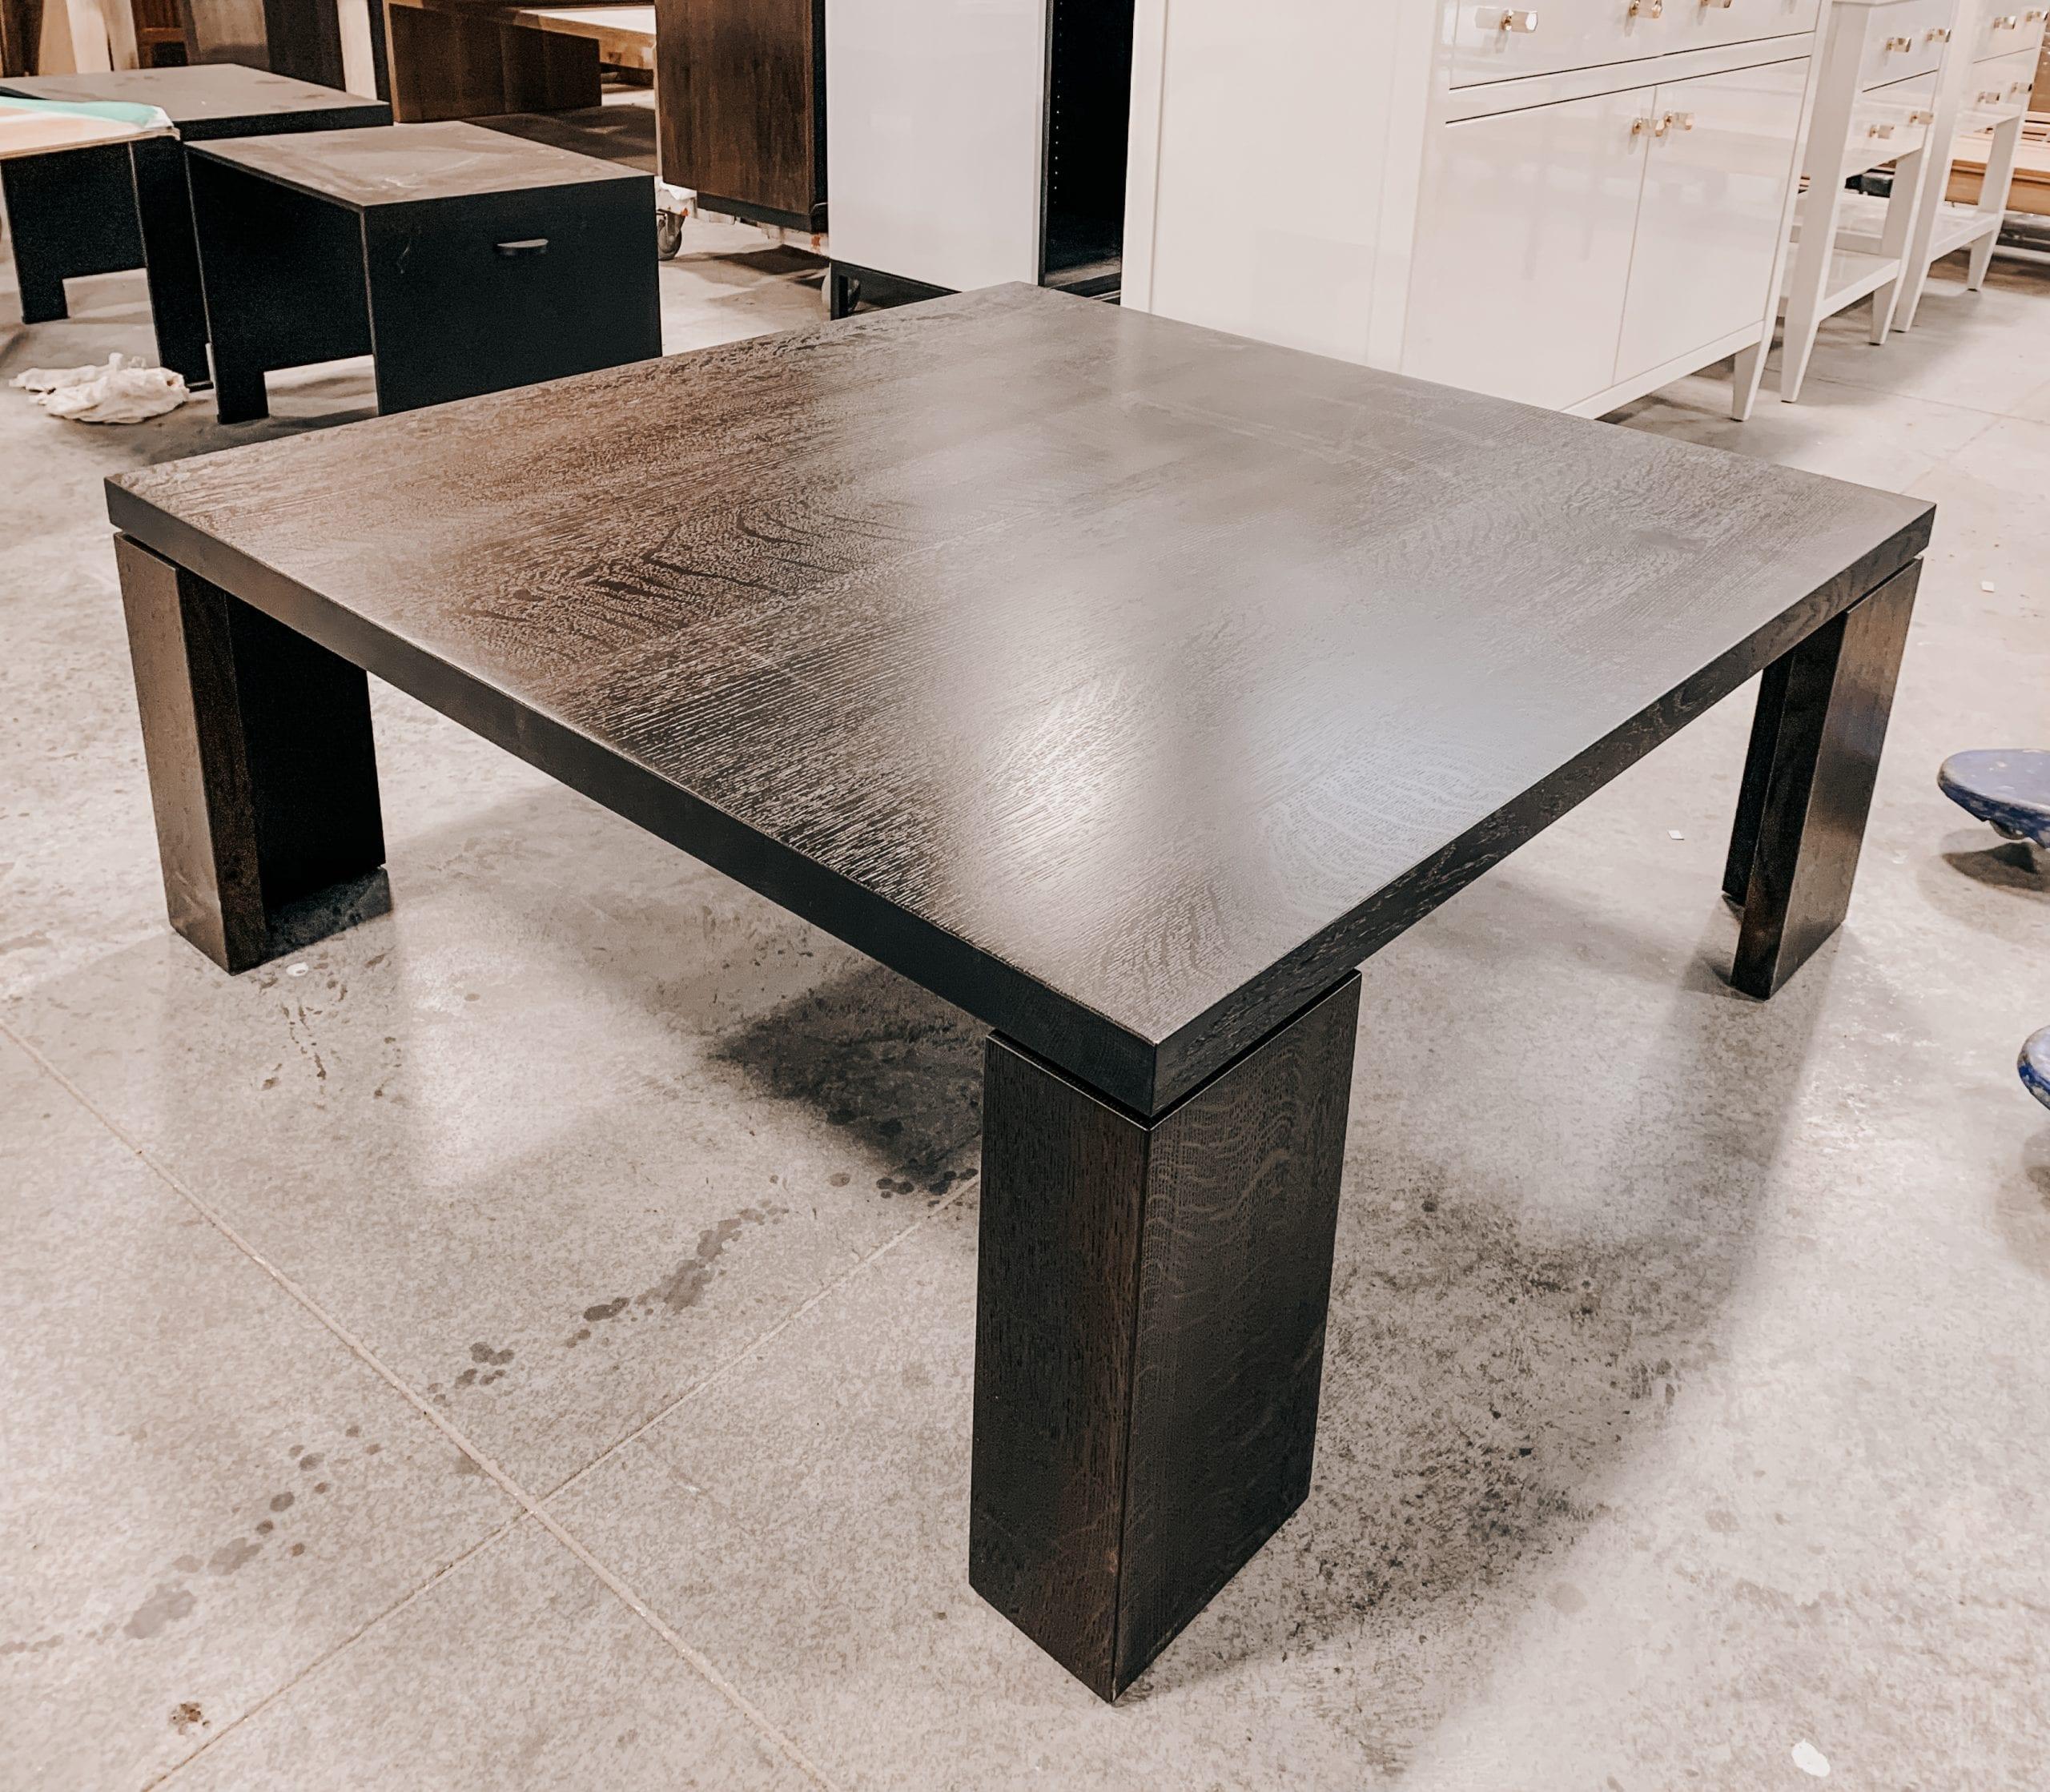 White Oak Coffee Table with Ebonized Wood Grain